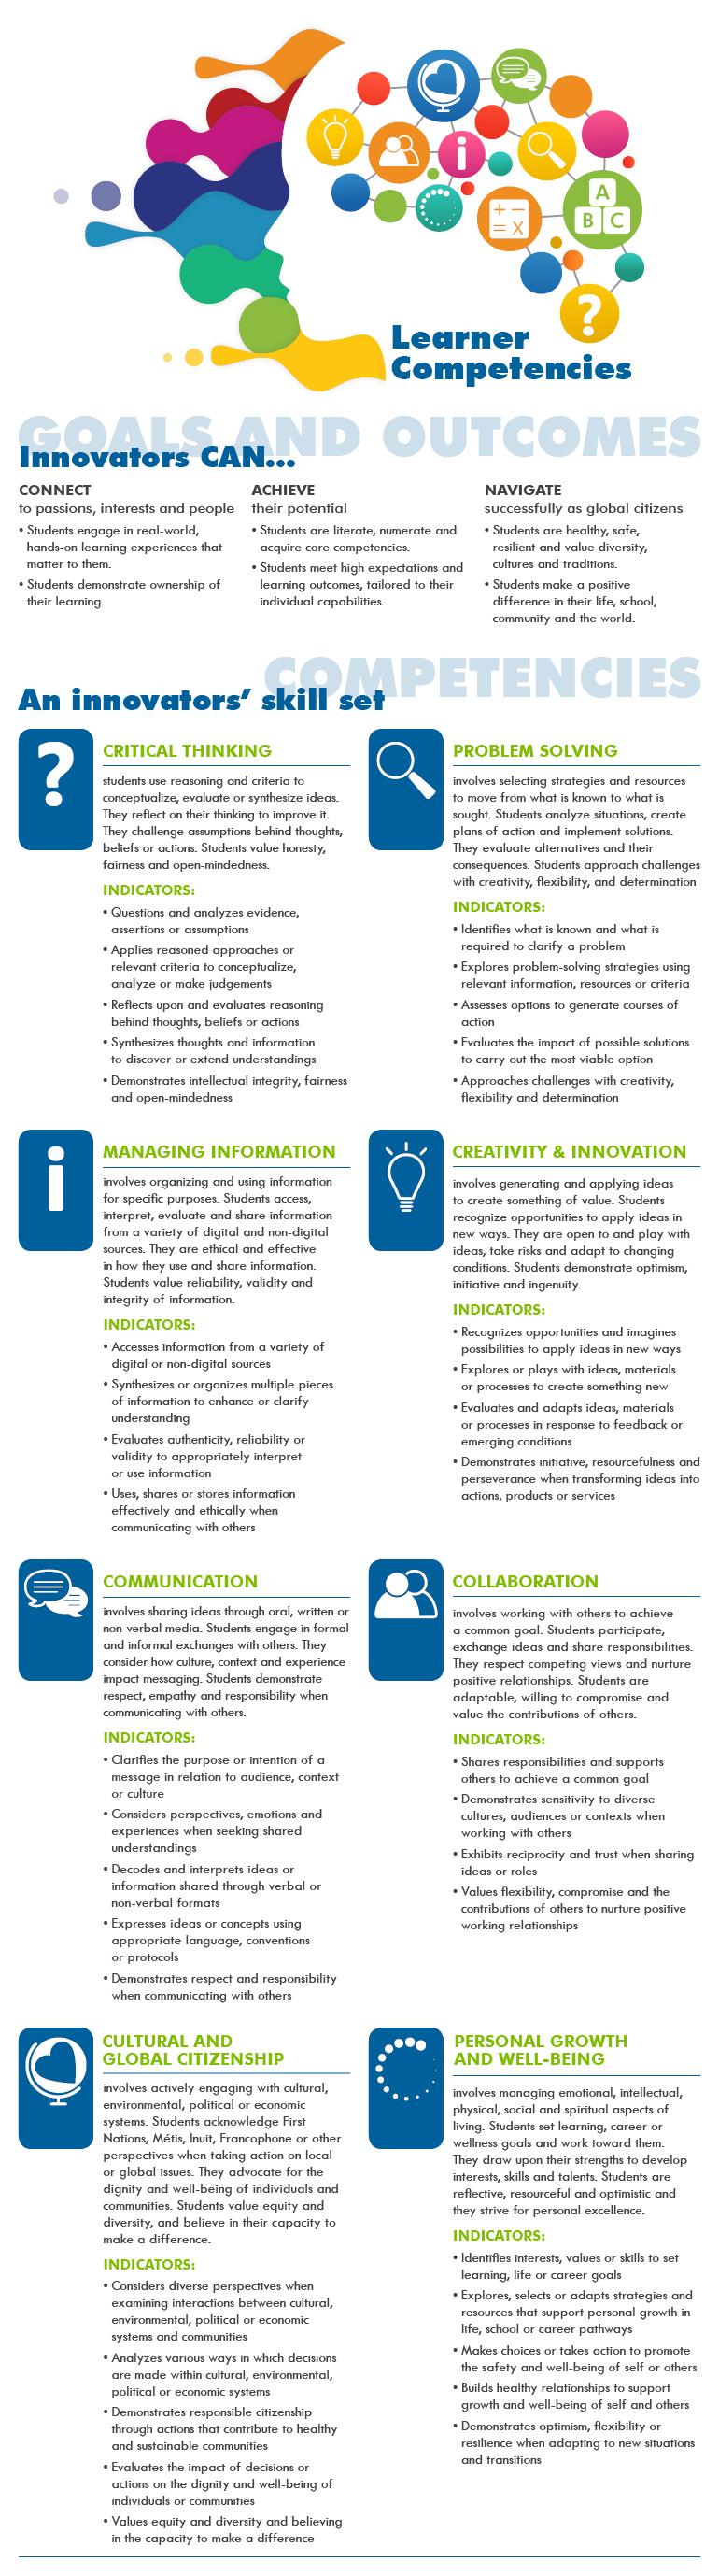 Learner Competencies